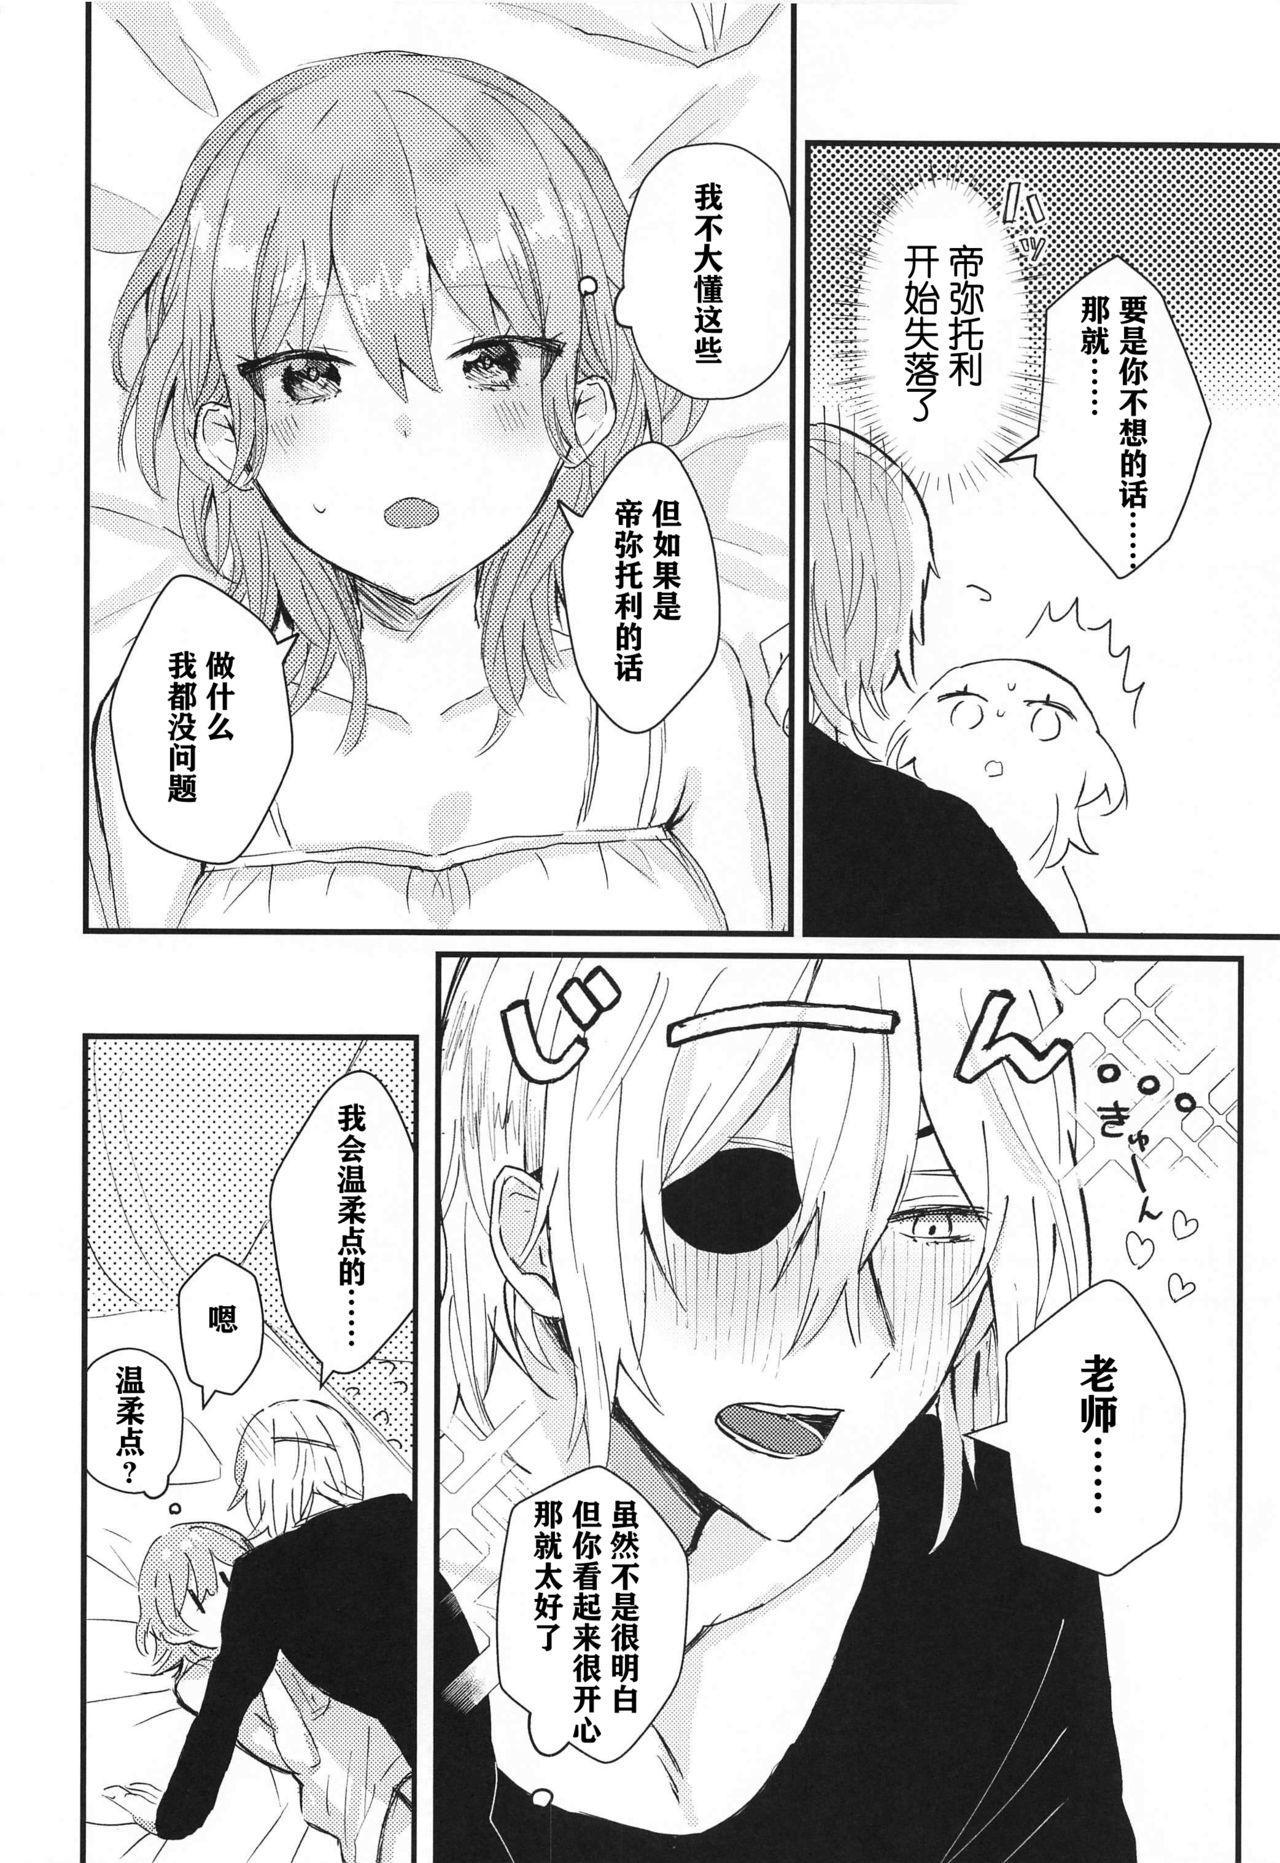 Sensei no Hatena - What the professor doesn't know 5